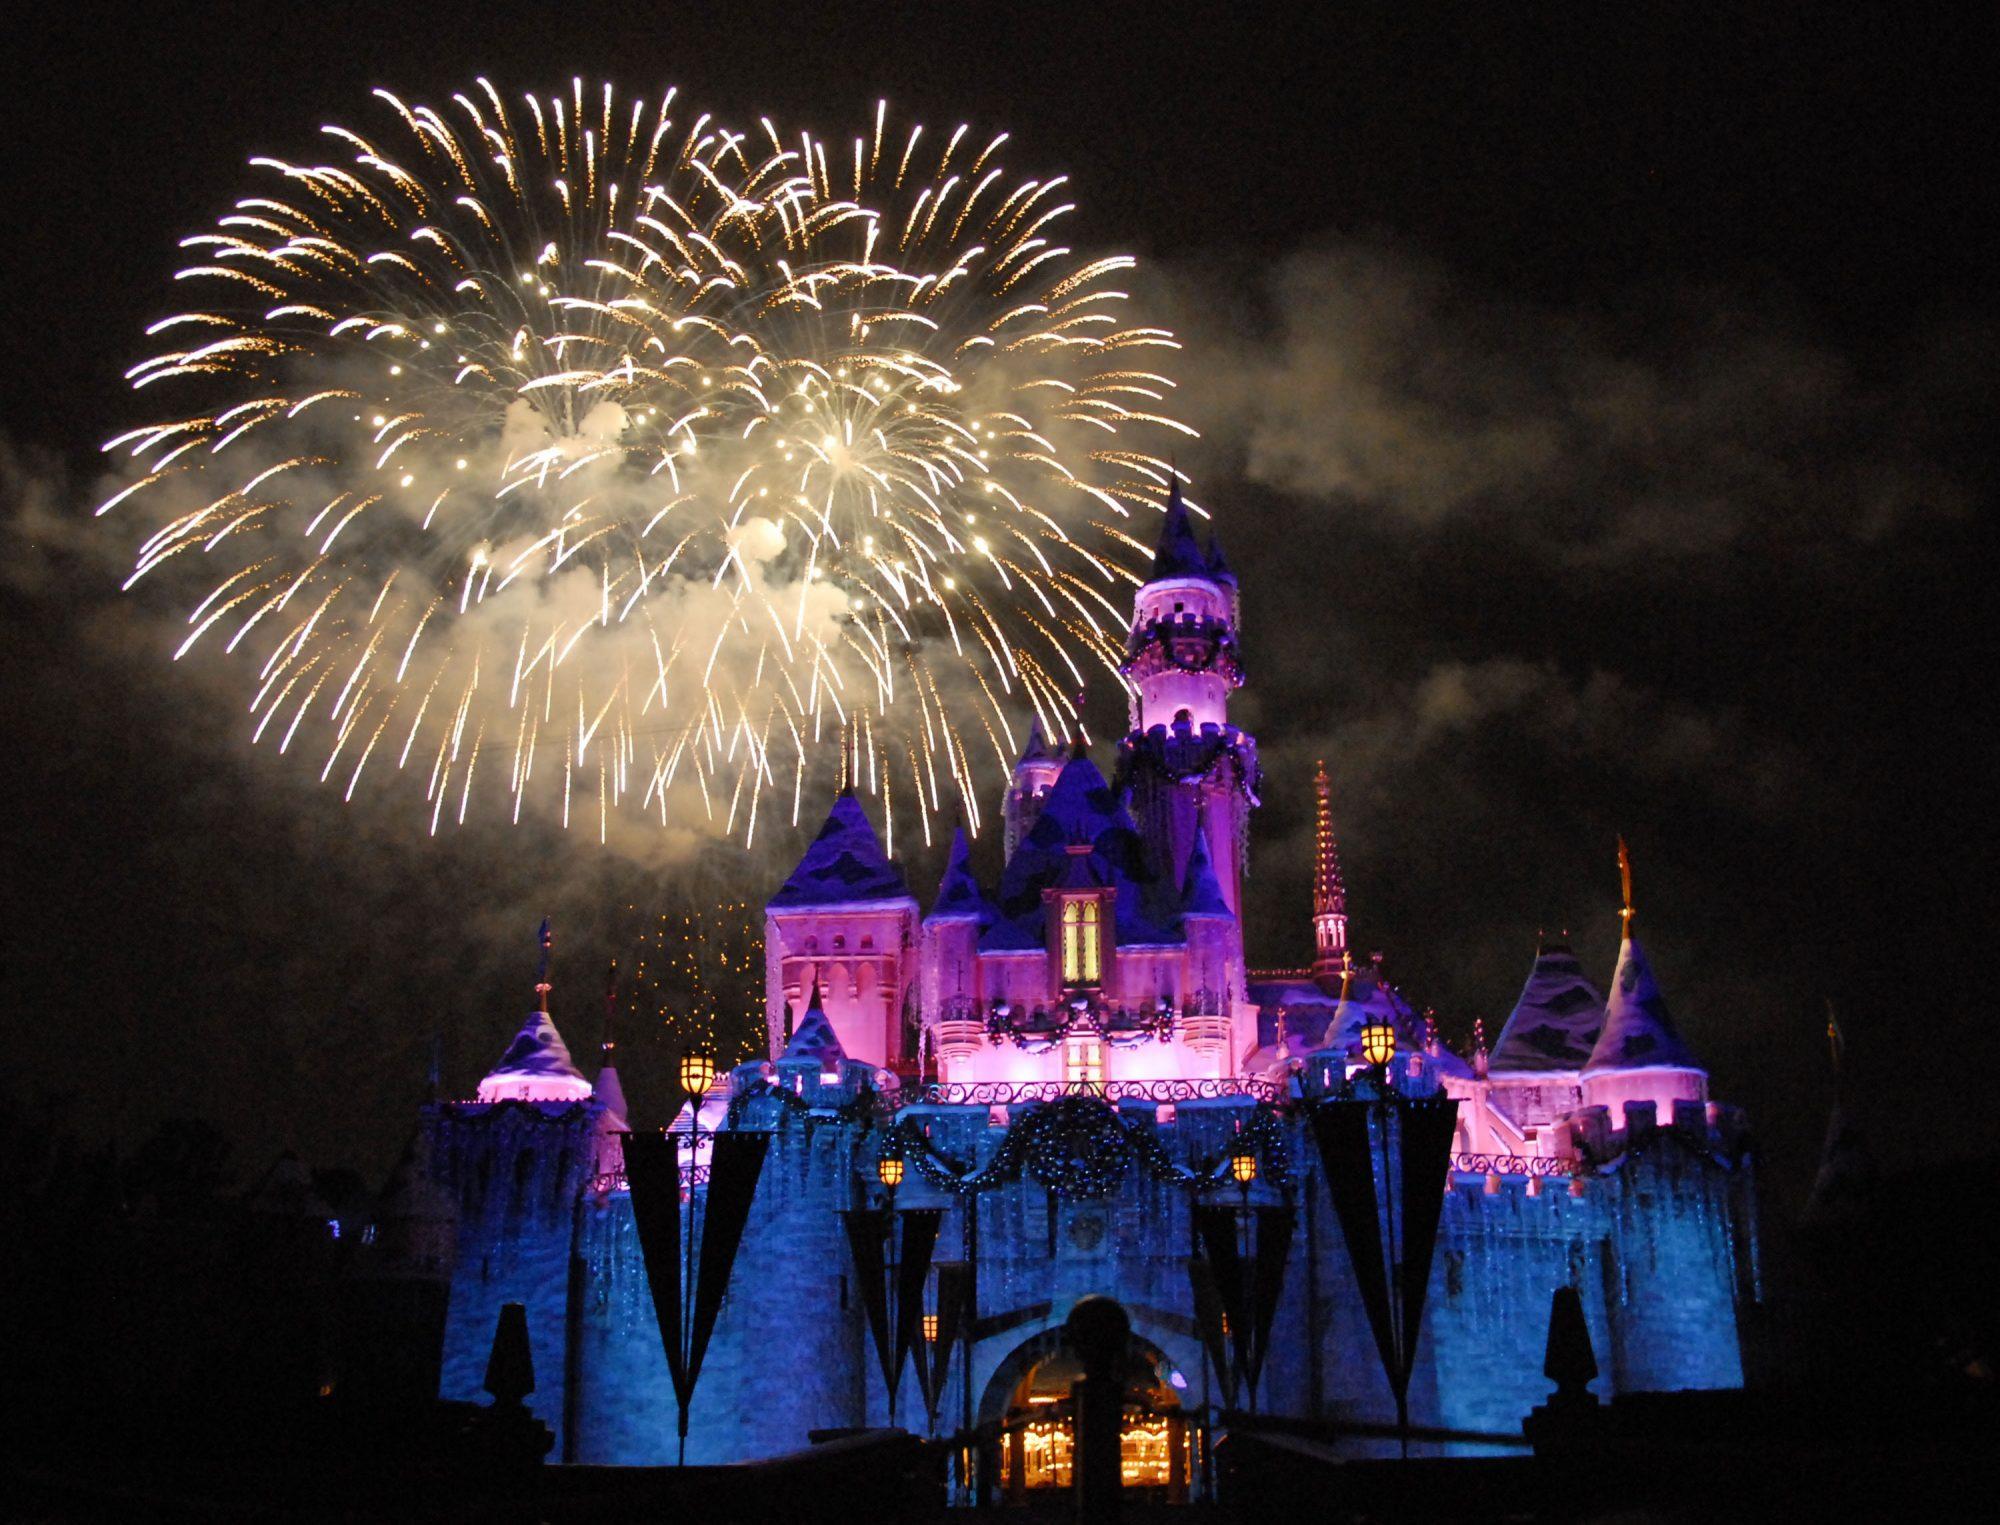 Disneyland Holiday Castle and Fireworks